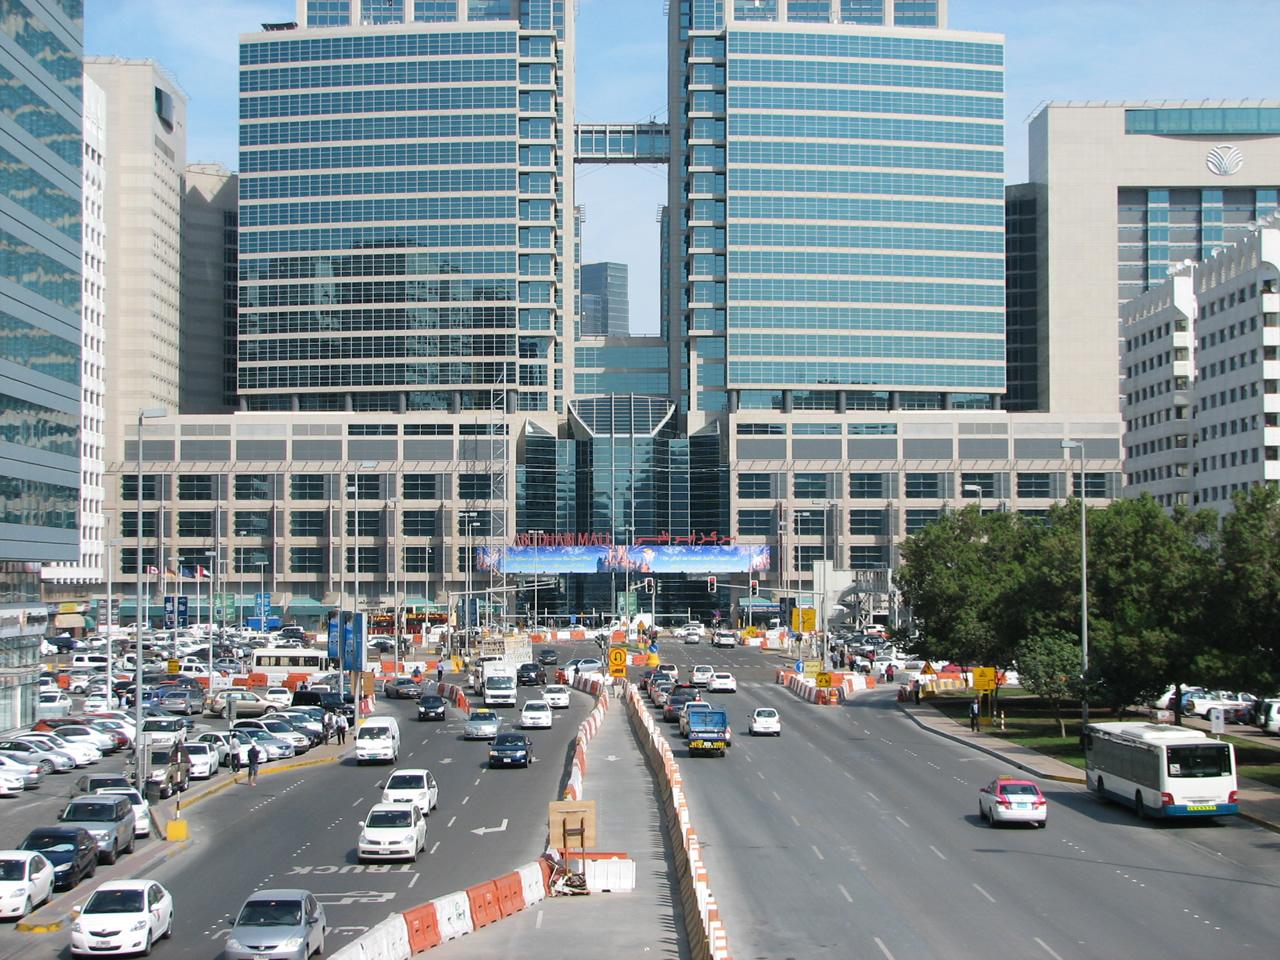 Abu Dhabi Mall Abu Dhabi 1